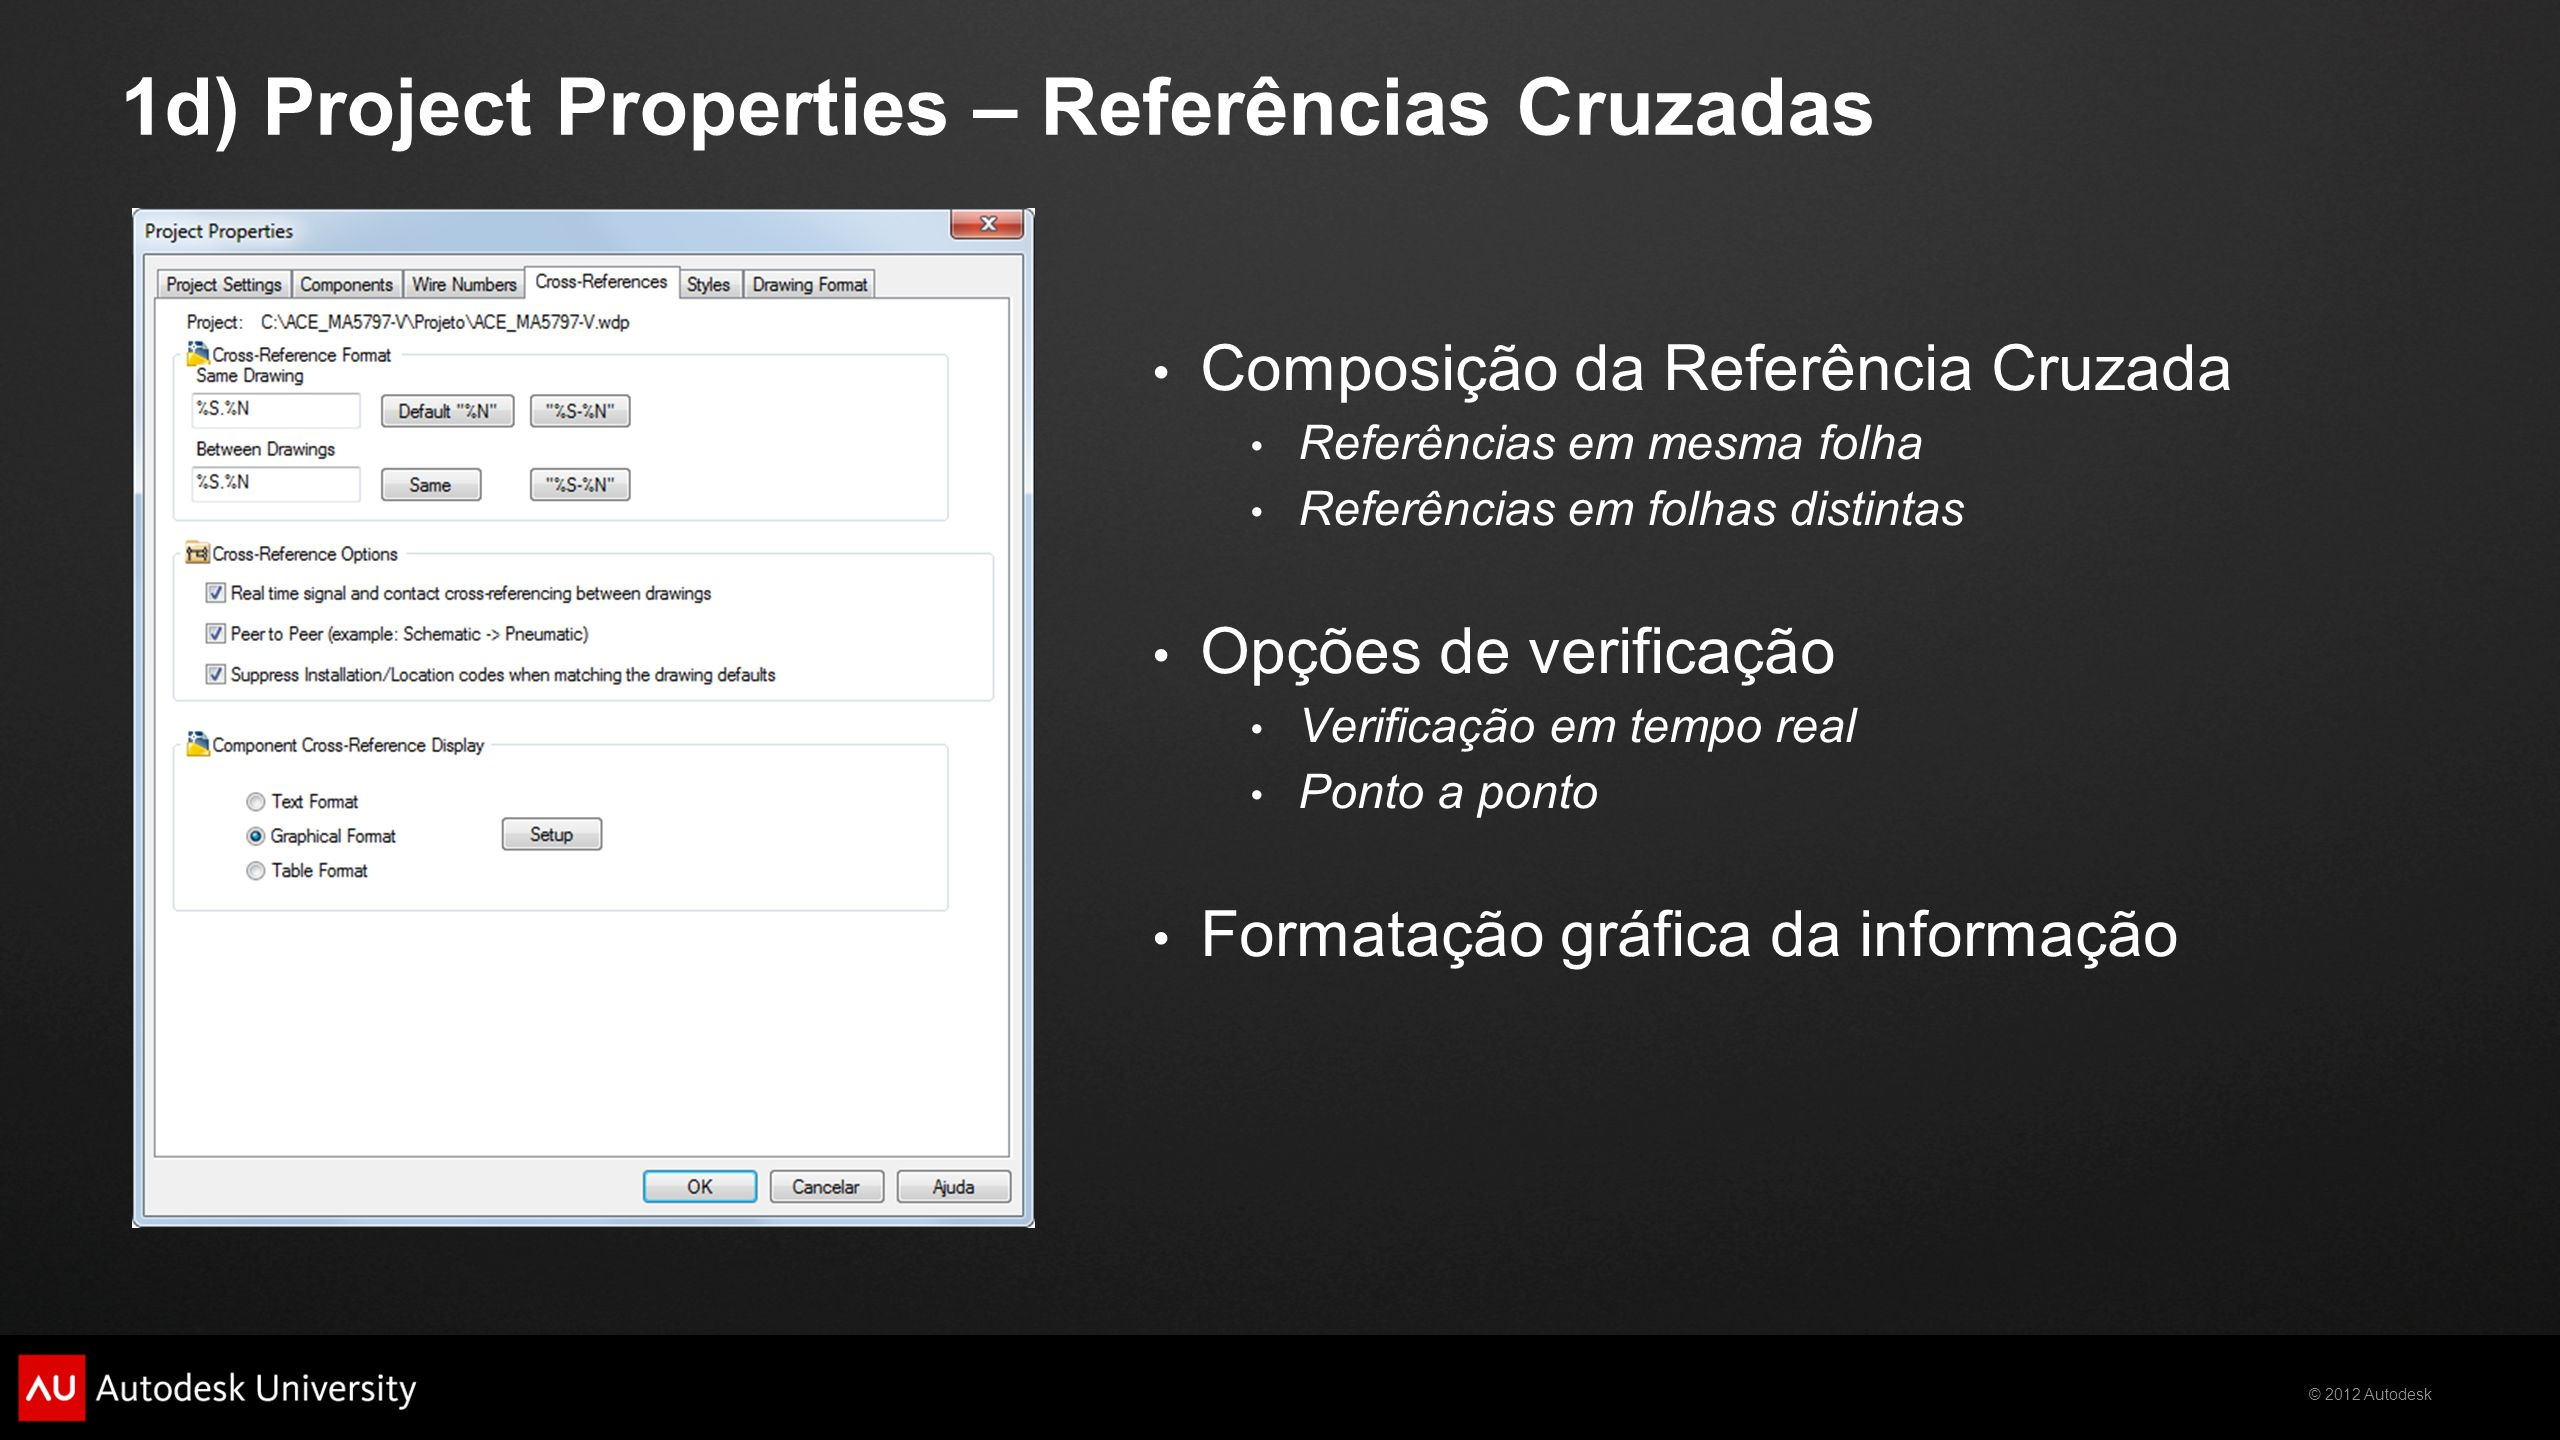 © 2012 Autodesk 1d) Project Properties – Referências Cruzadas Composição da Referência Cruzada Referências em mesma folha Referências em folhas distin